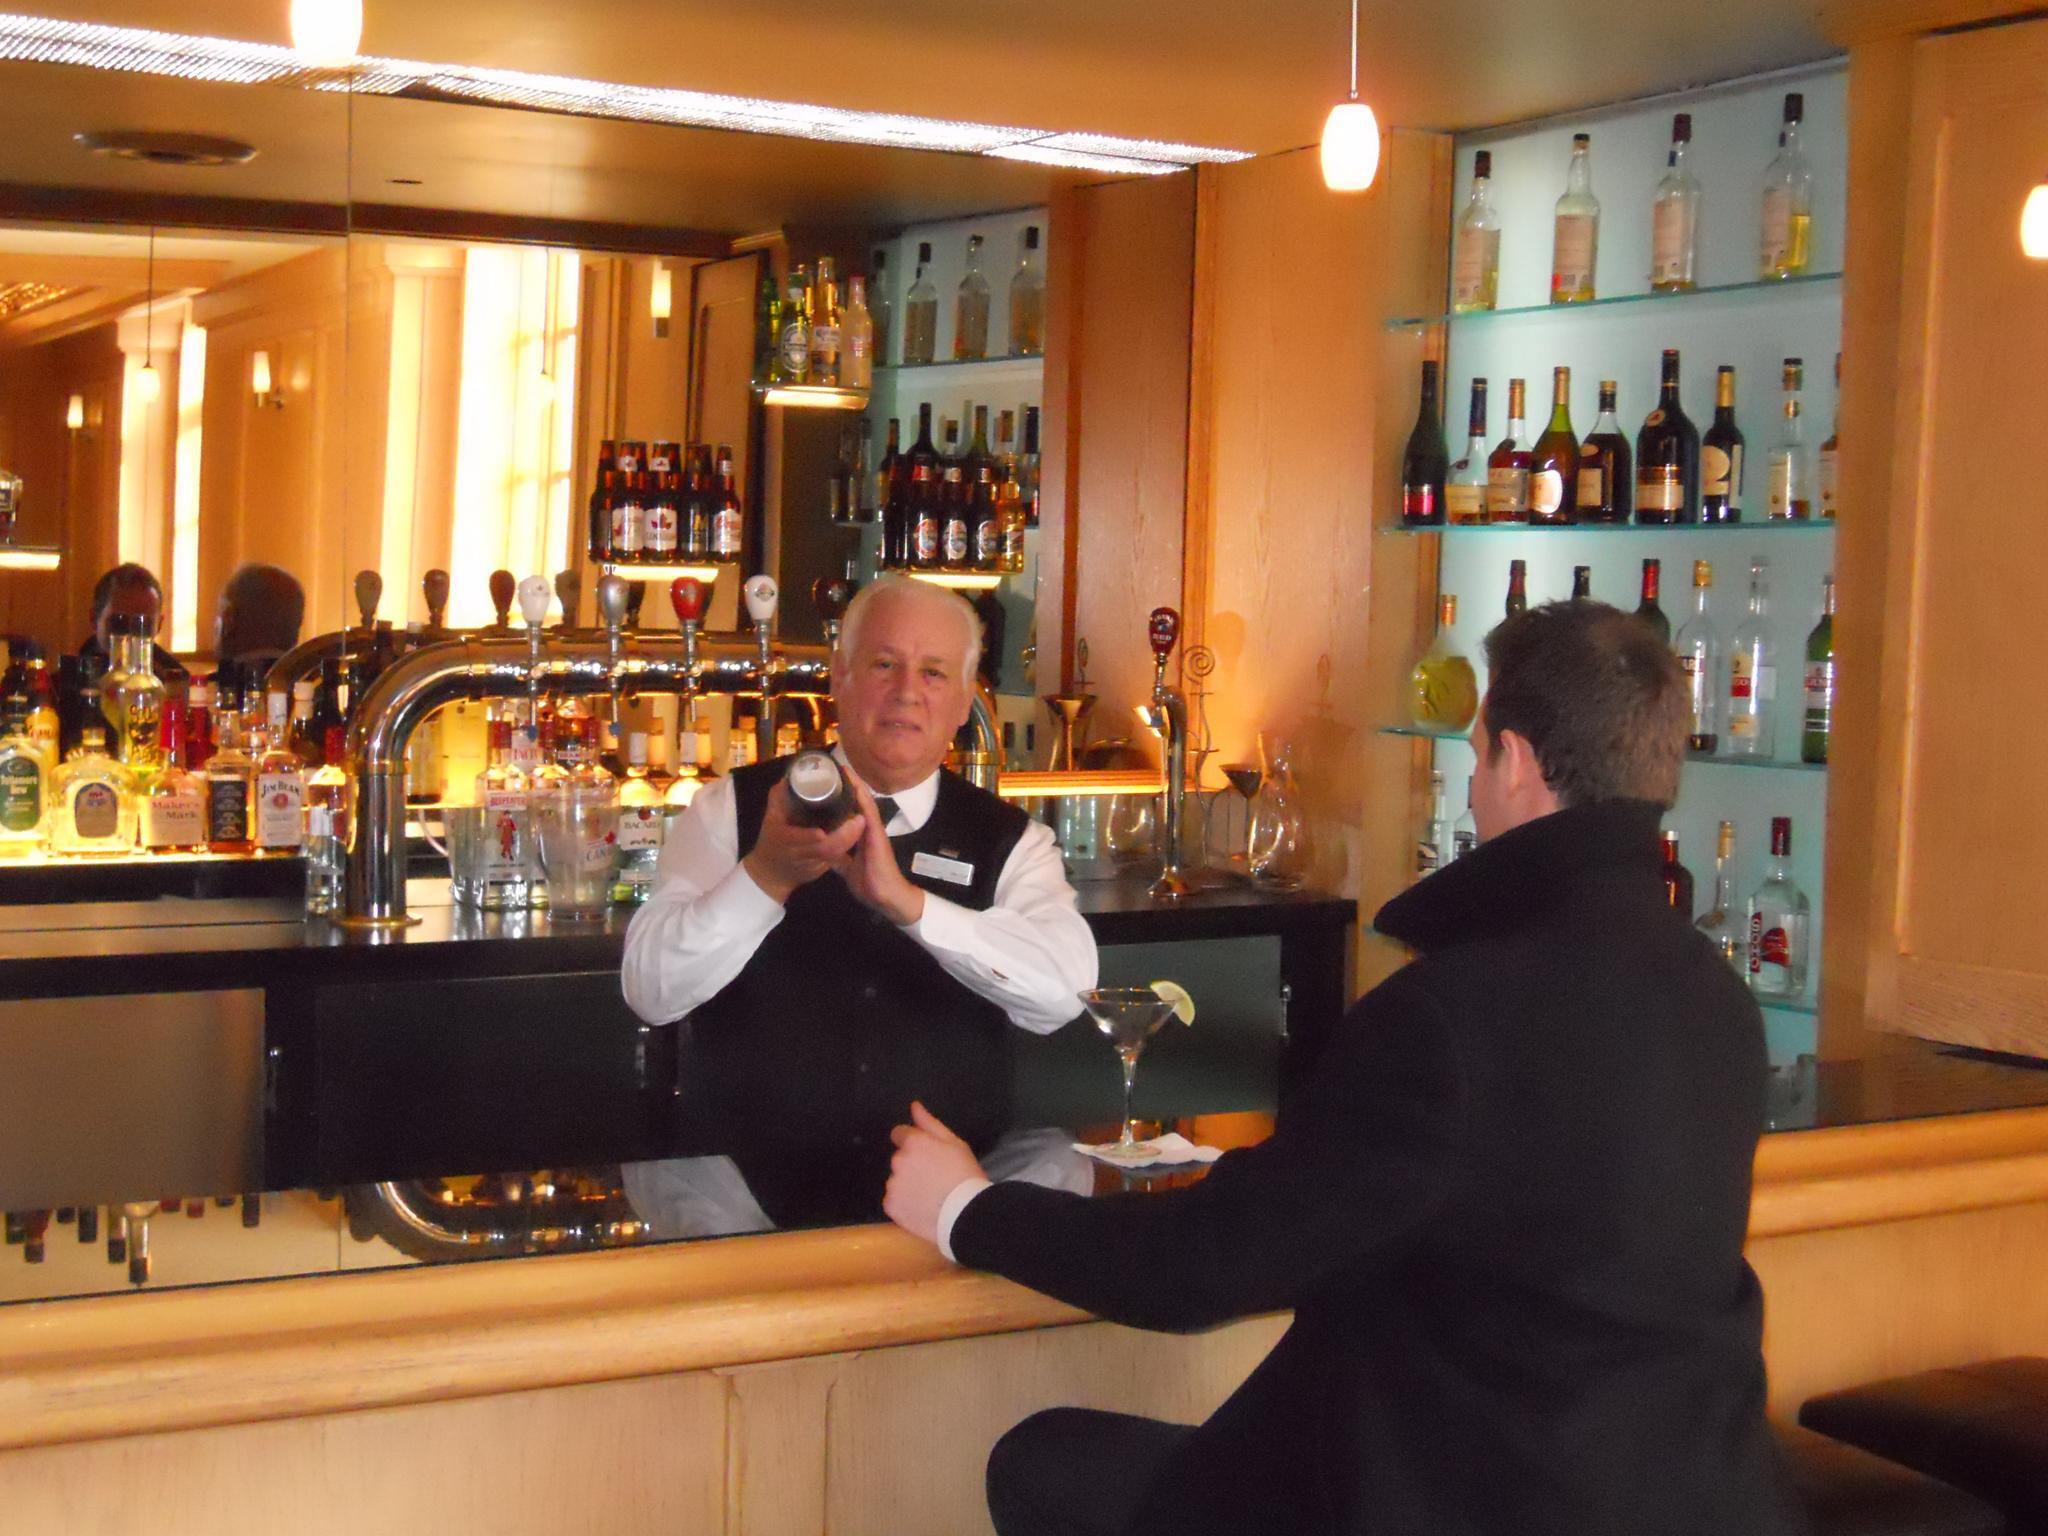 Hotel Bartender Hotel Bartender